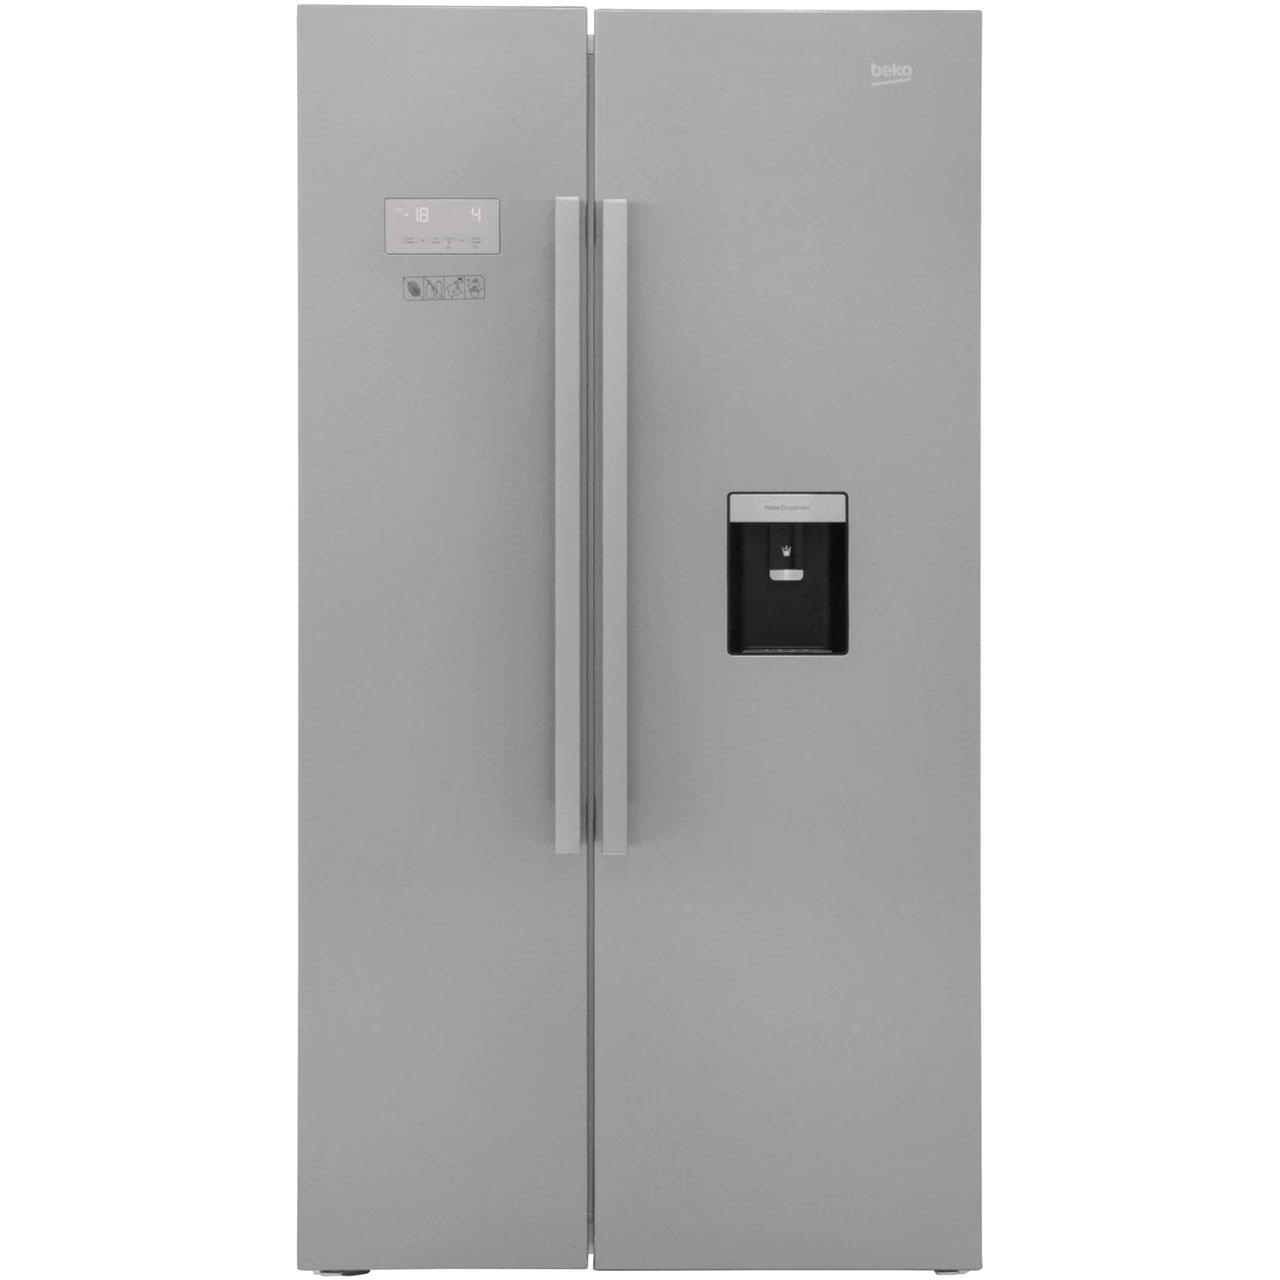 Beko ASD241X Free Standing American Fridge Freezer in Stainless Steel